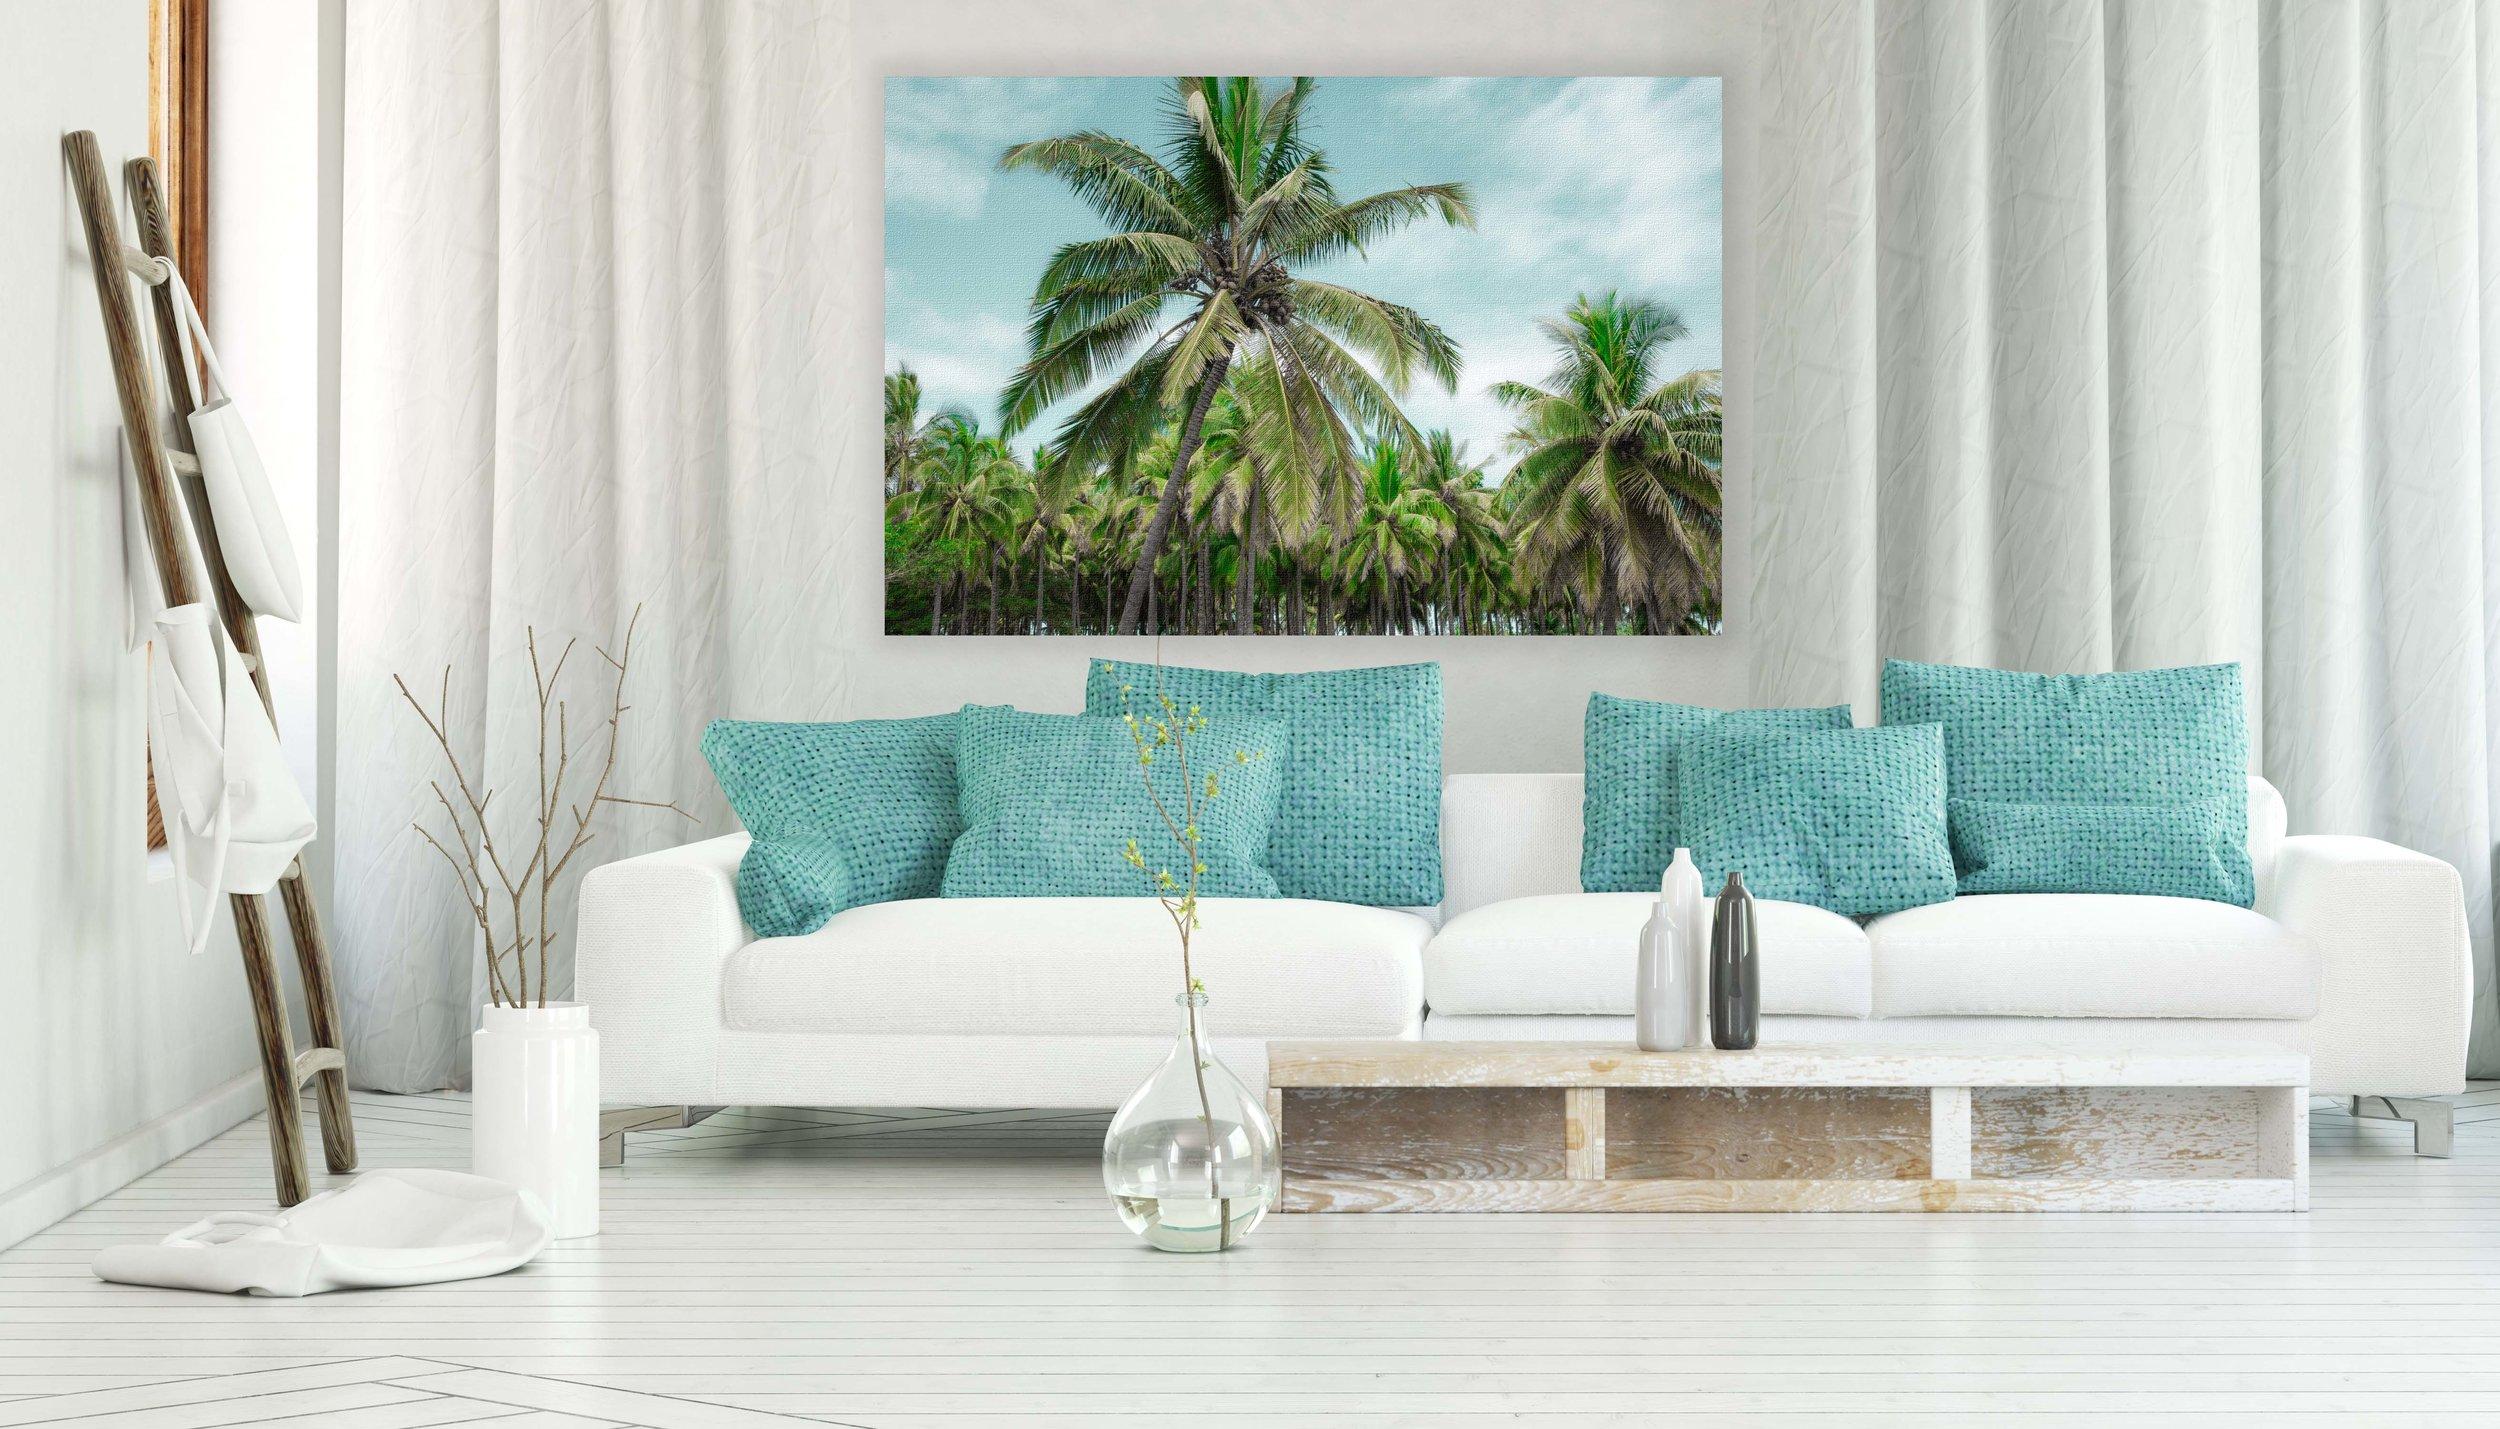 HAWAIISCAPE FINE ART PHOTOGRAPHY